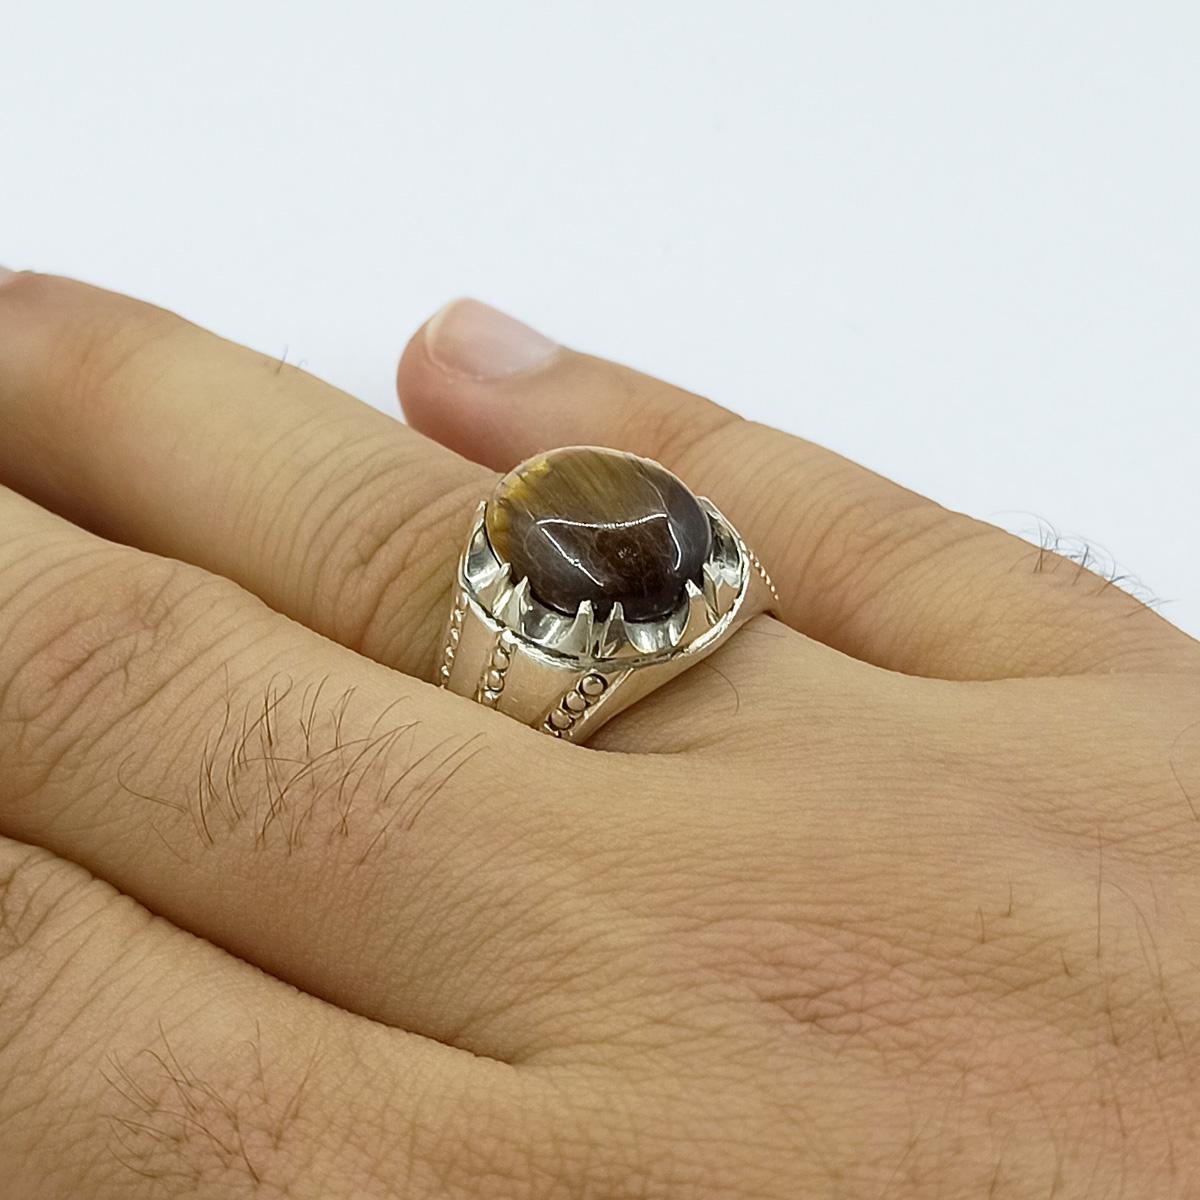 انگشتر نقره مردانه سلین کالا مدل چشم ببر کد ce-As18